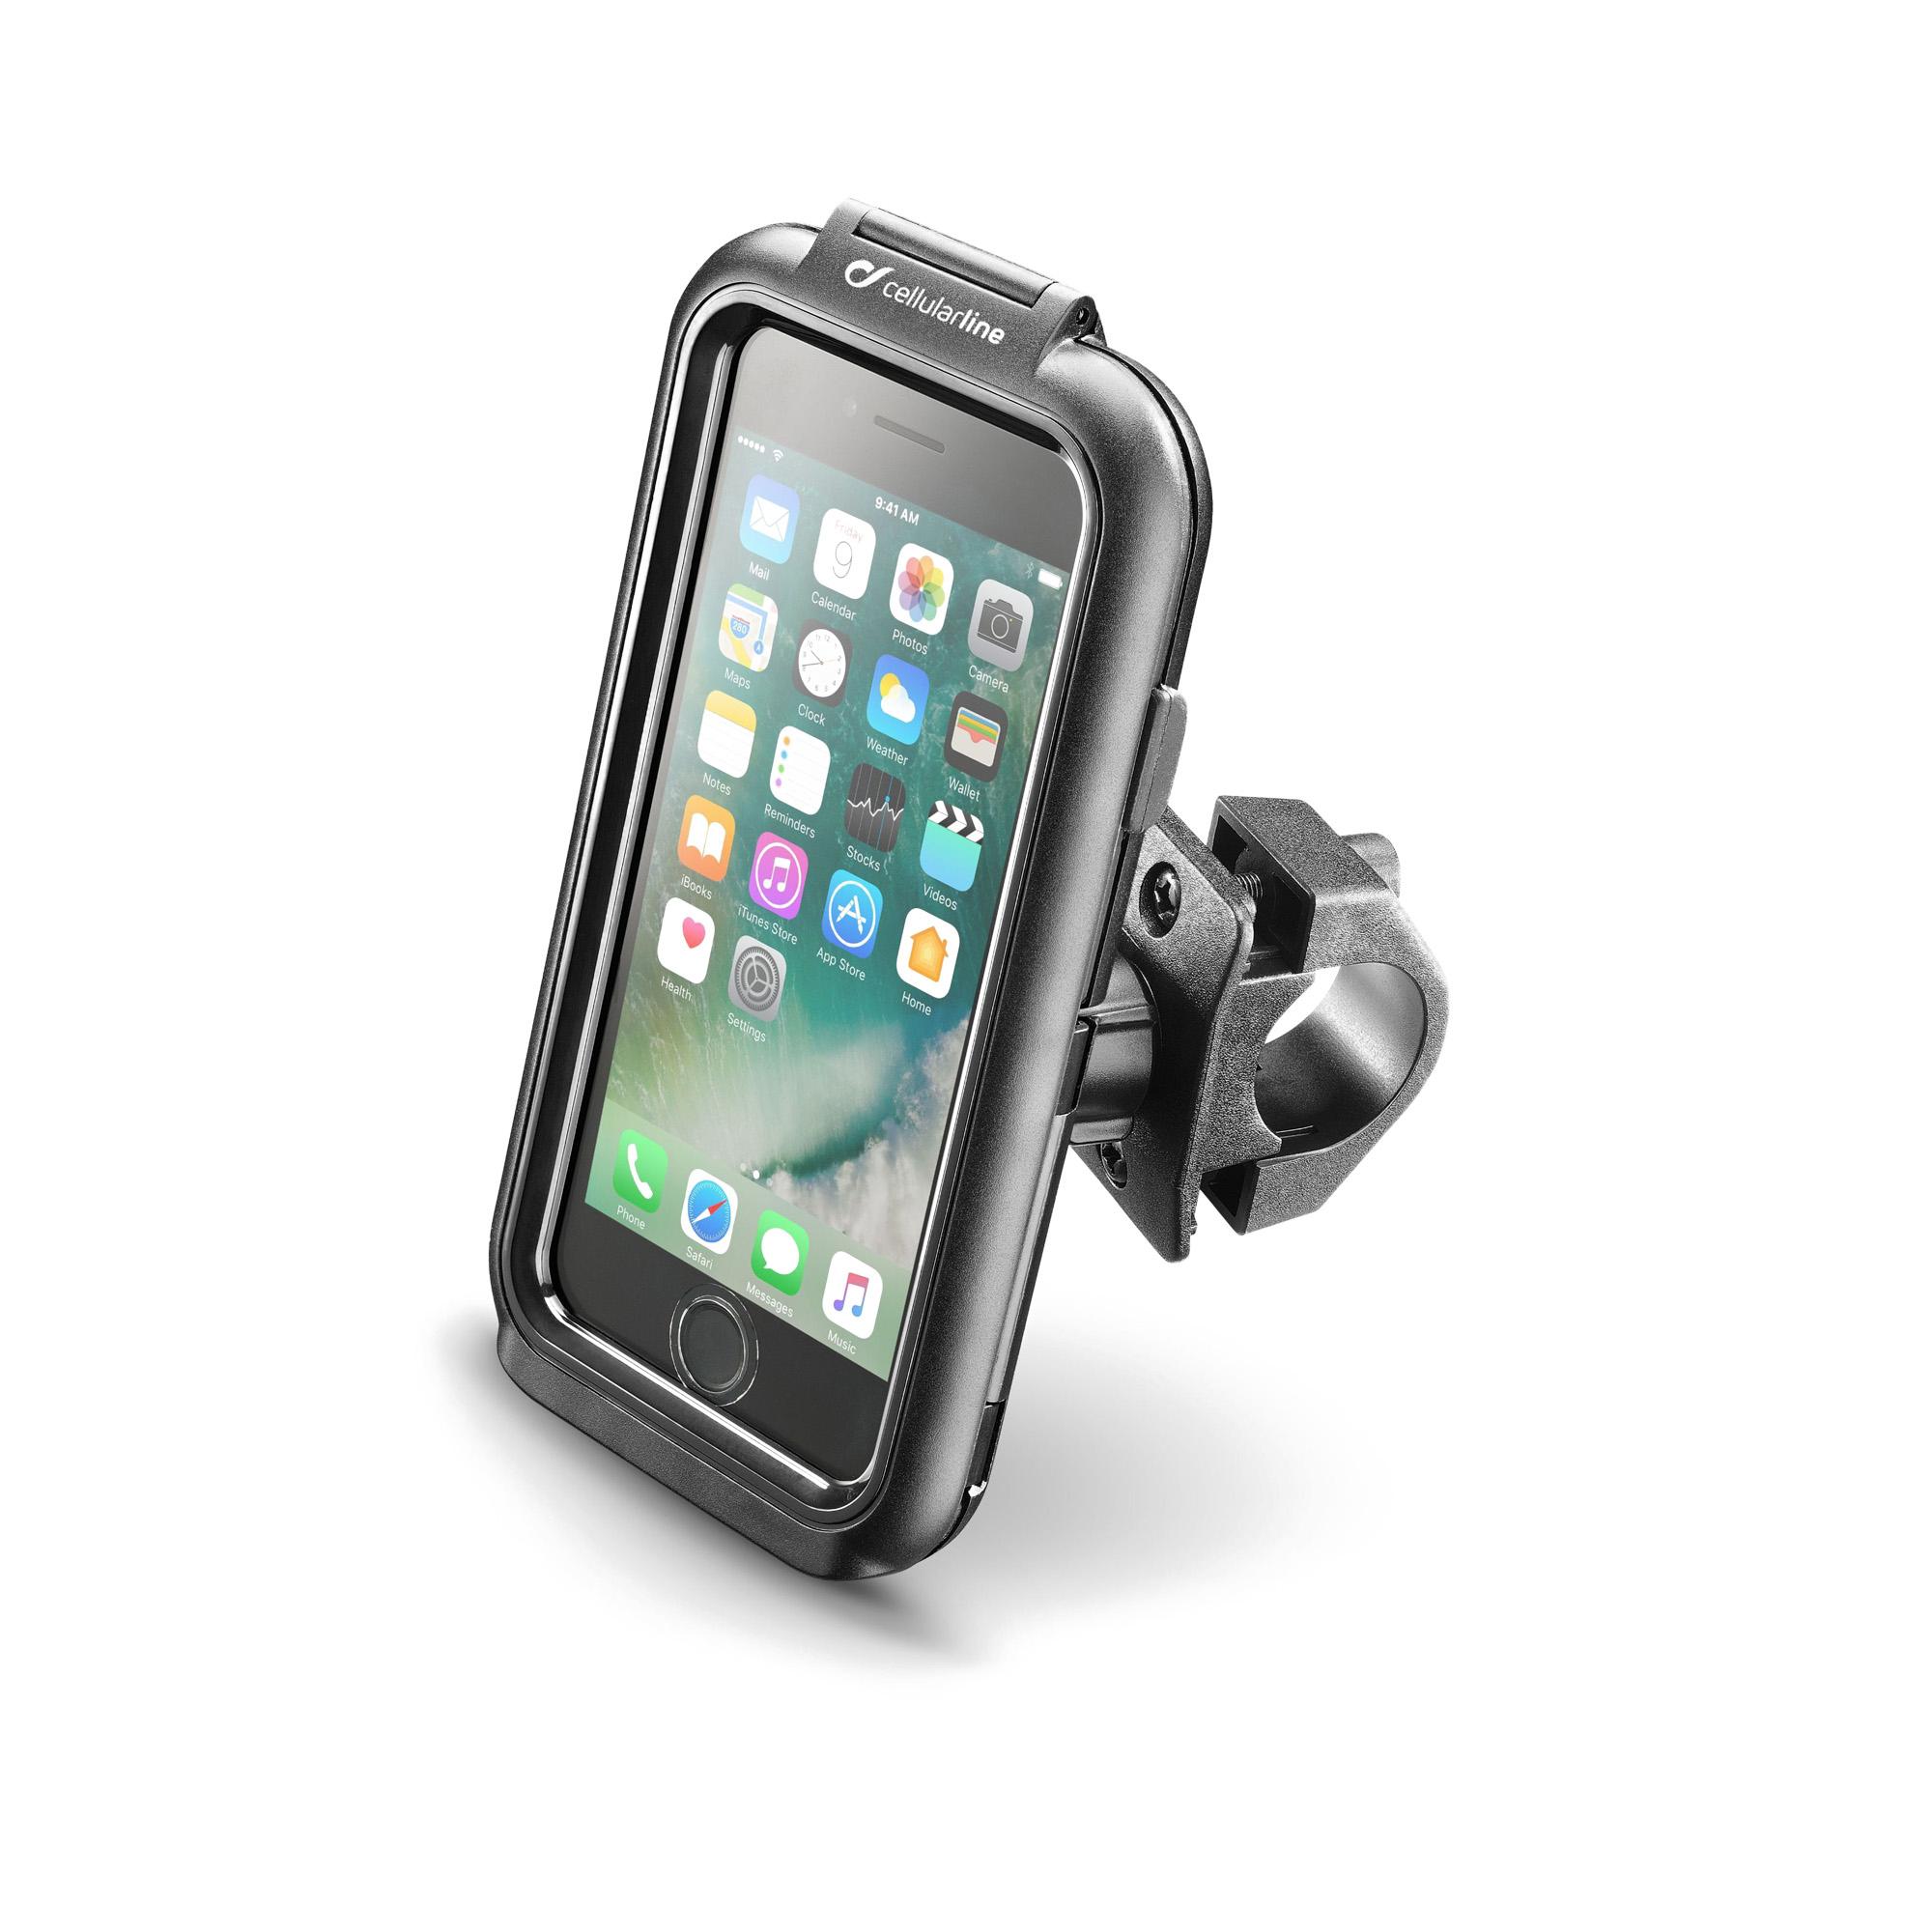 Interphone case